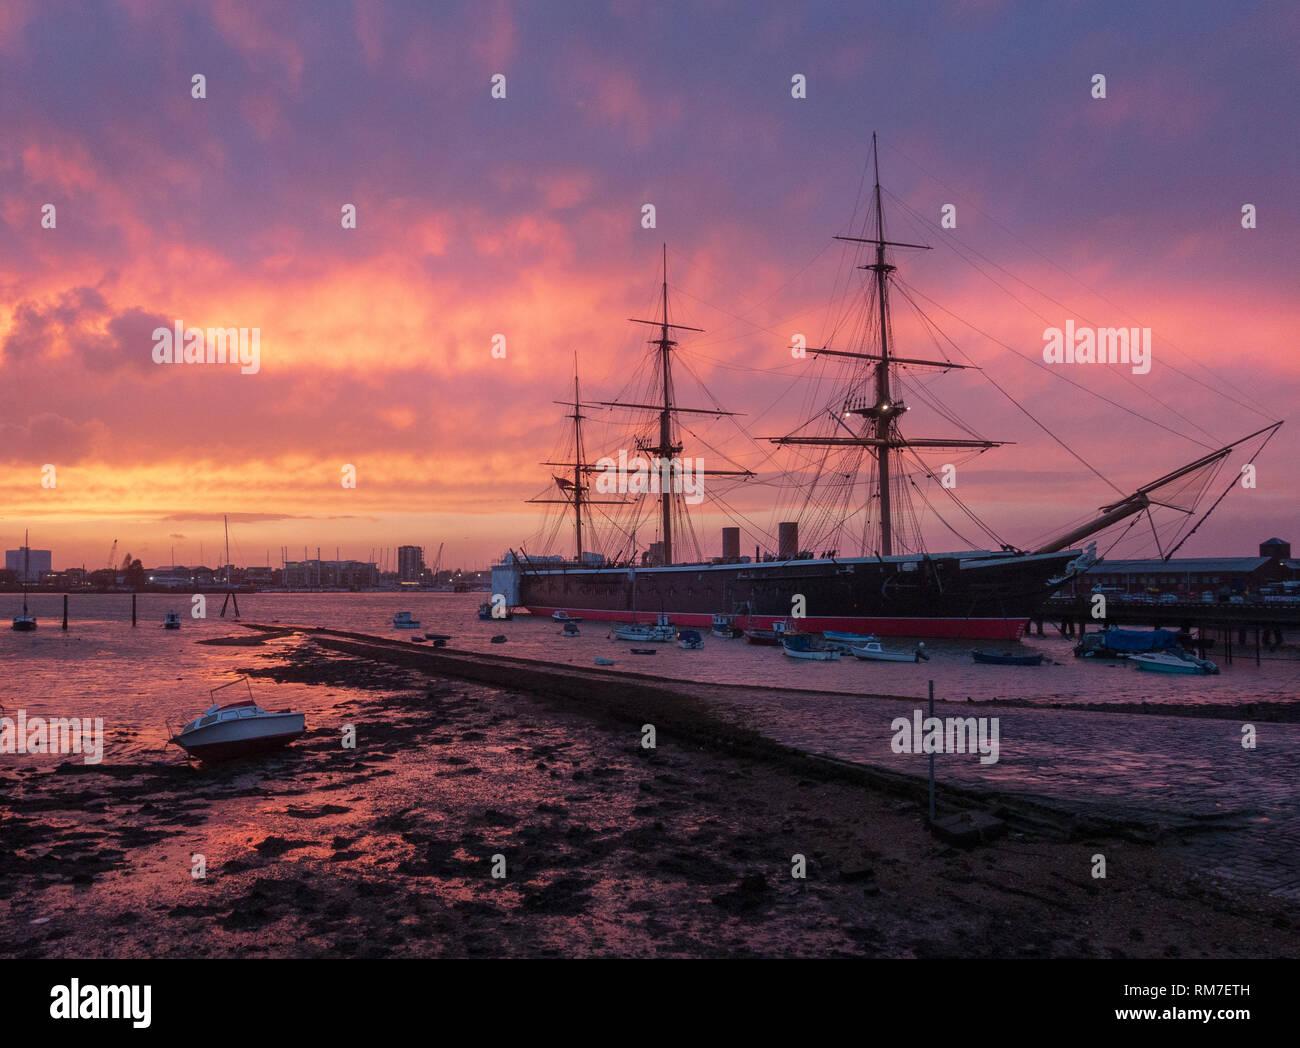 Historic warship HMS Warrior at sunset, Portsmouth Historic Dockyard, England - Stock Image